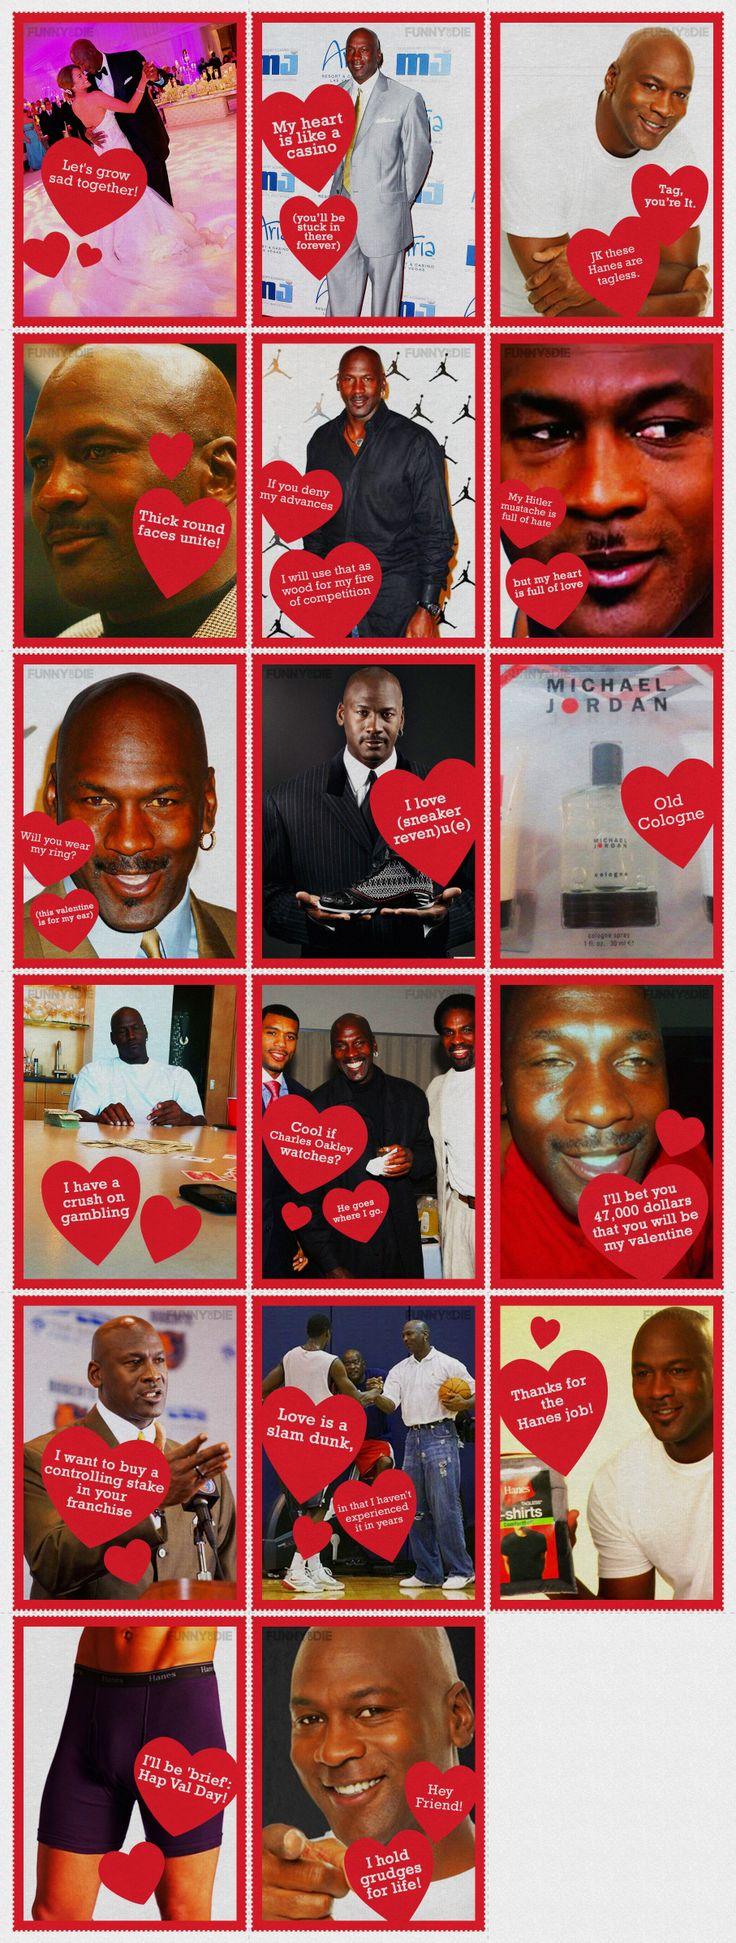 jordans valentine nebraska